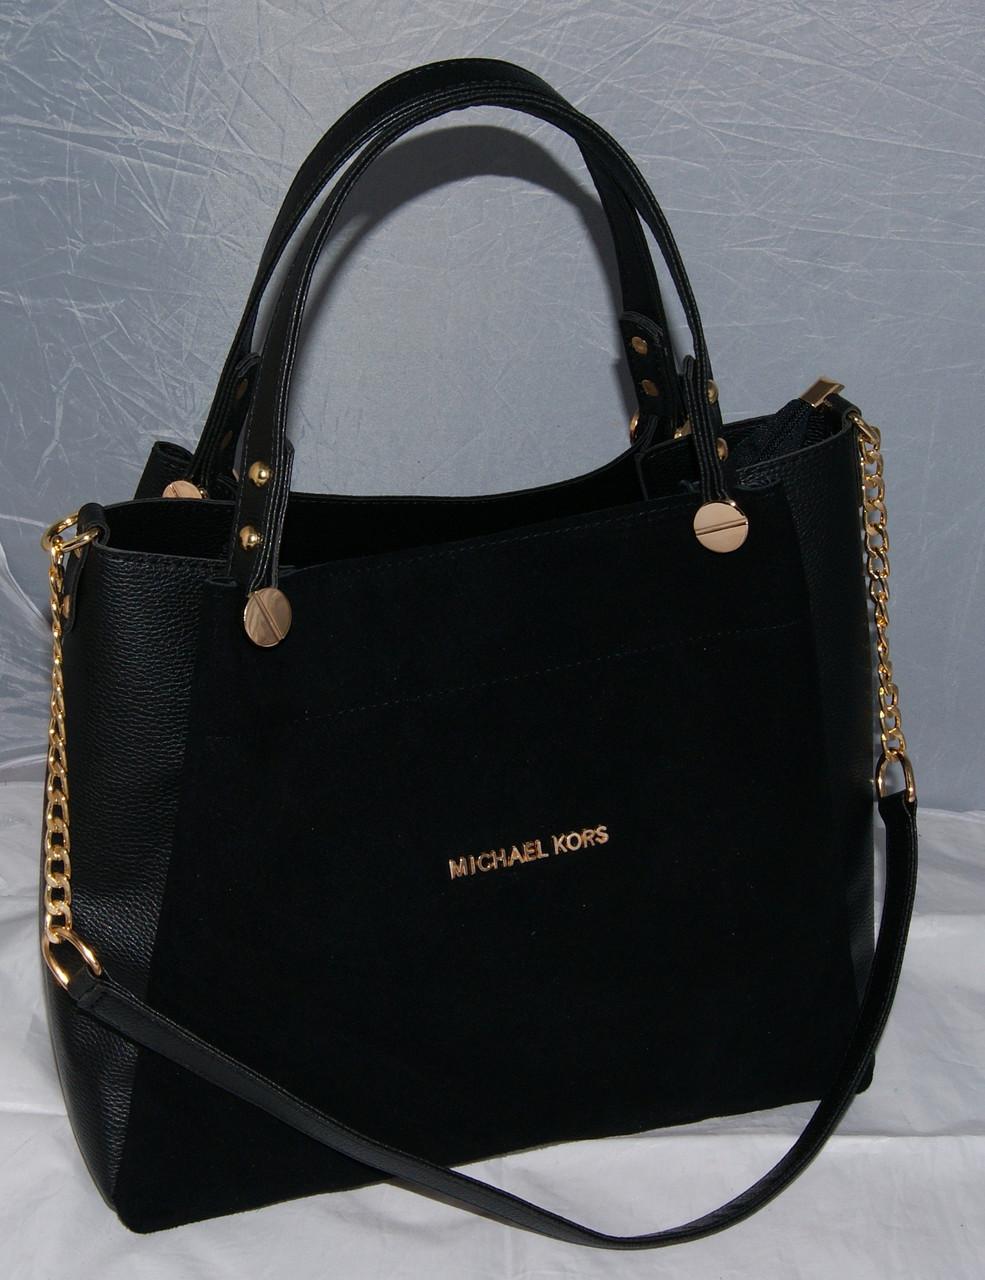 556ec600ff30 Женская замшевая сумка Michael Kors, цвет черный Майкл Корс MK ...